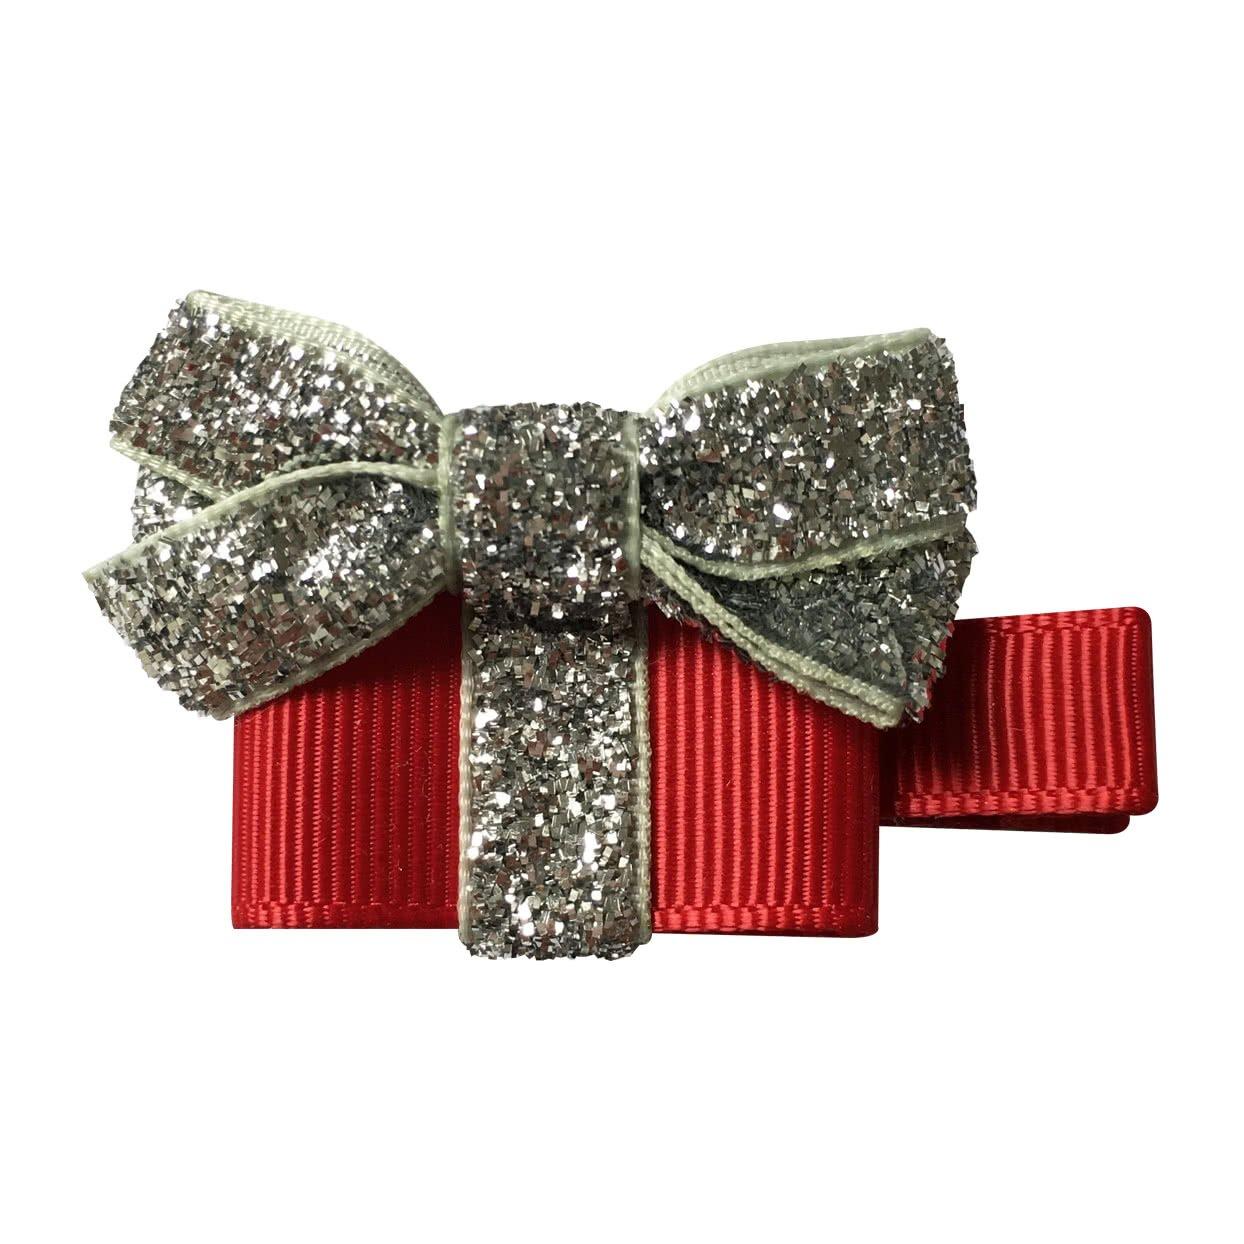 Image of Milledeux® Christmas gift - scarlet / silver